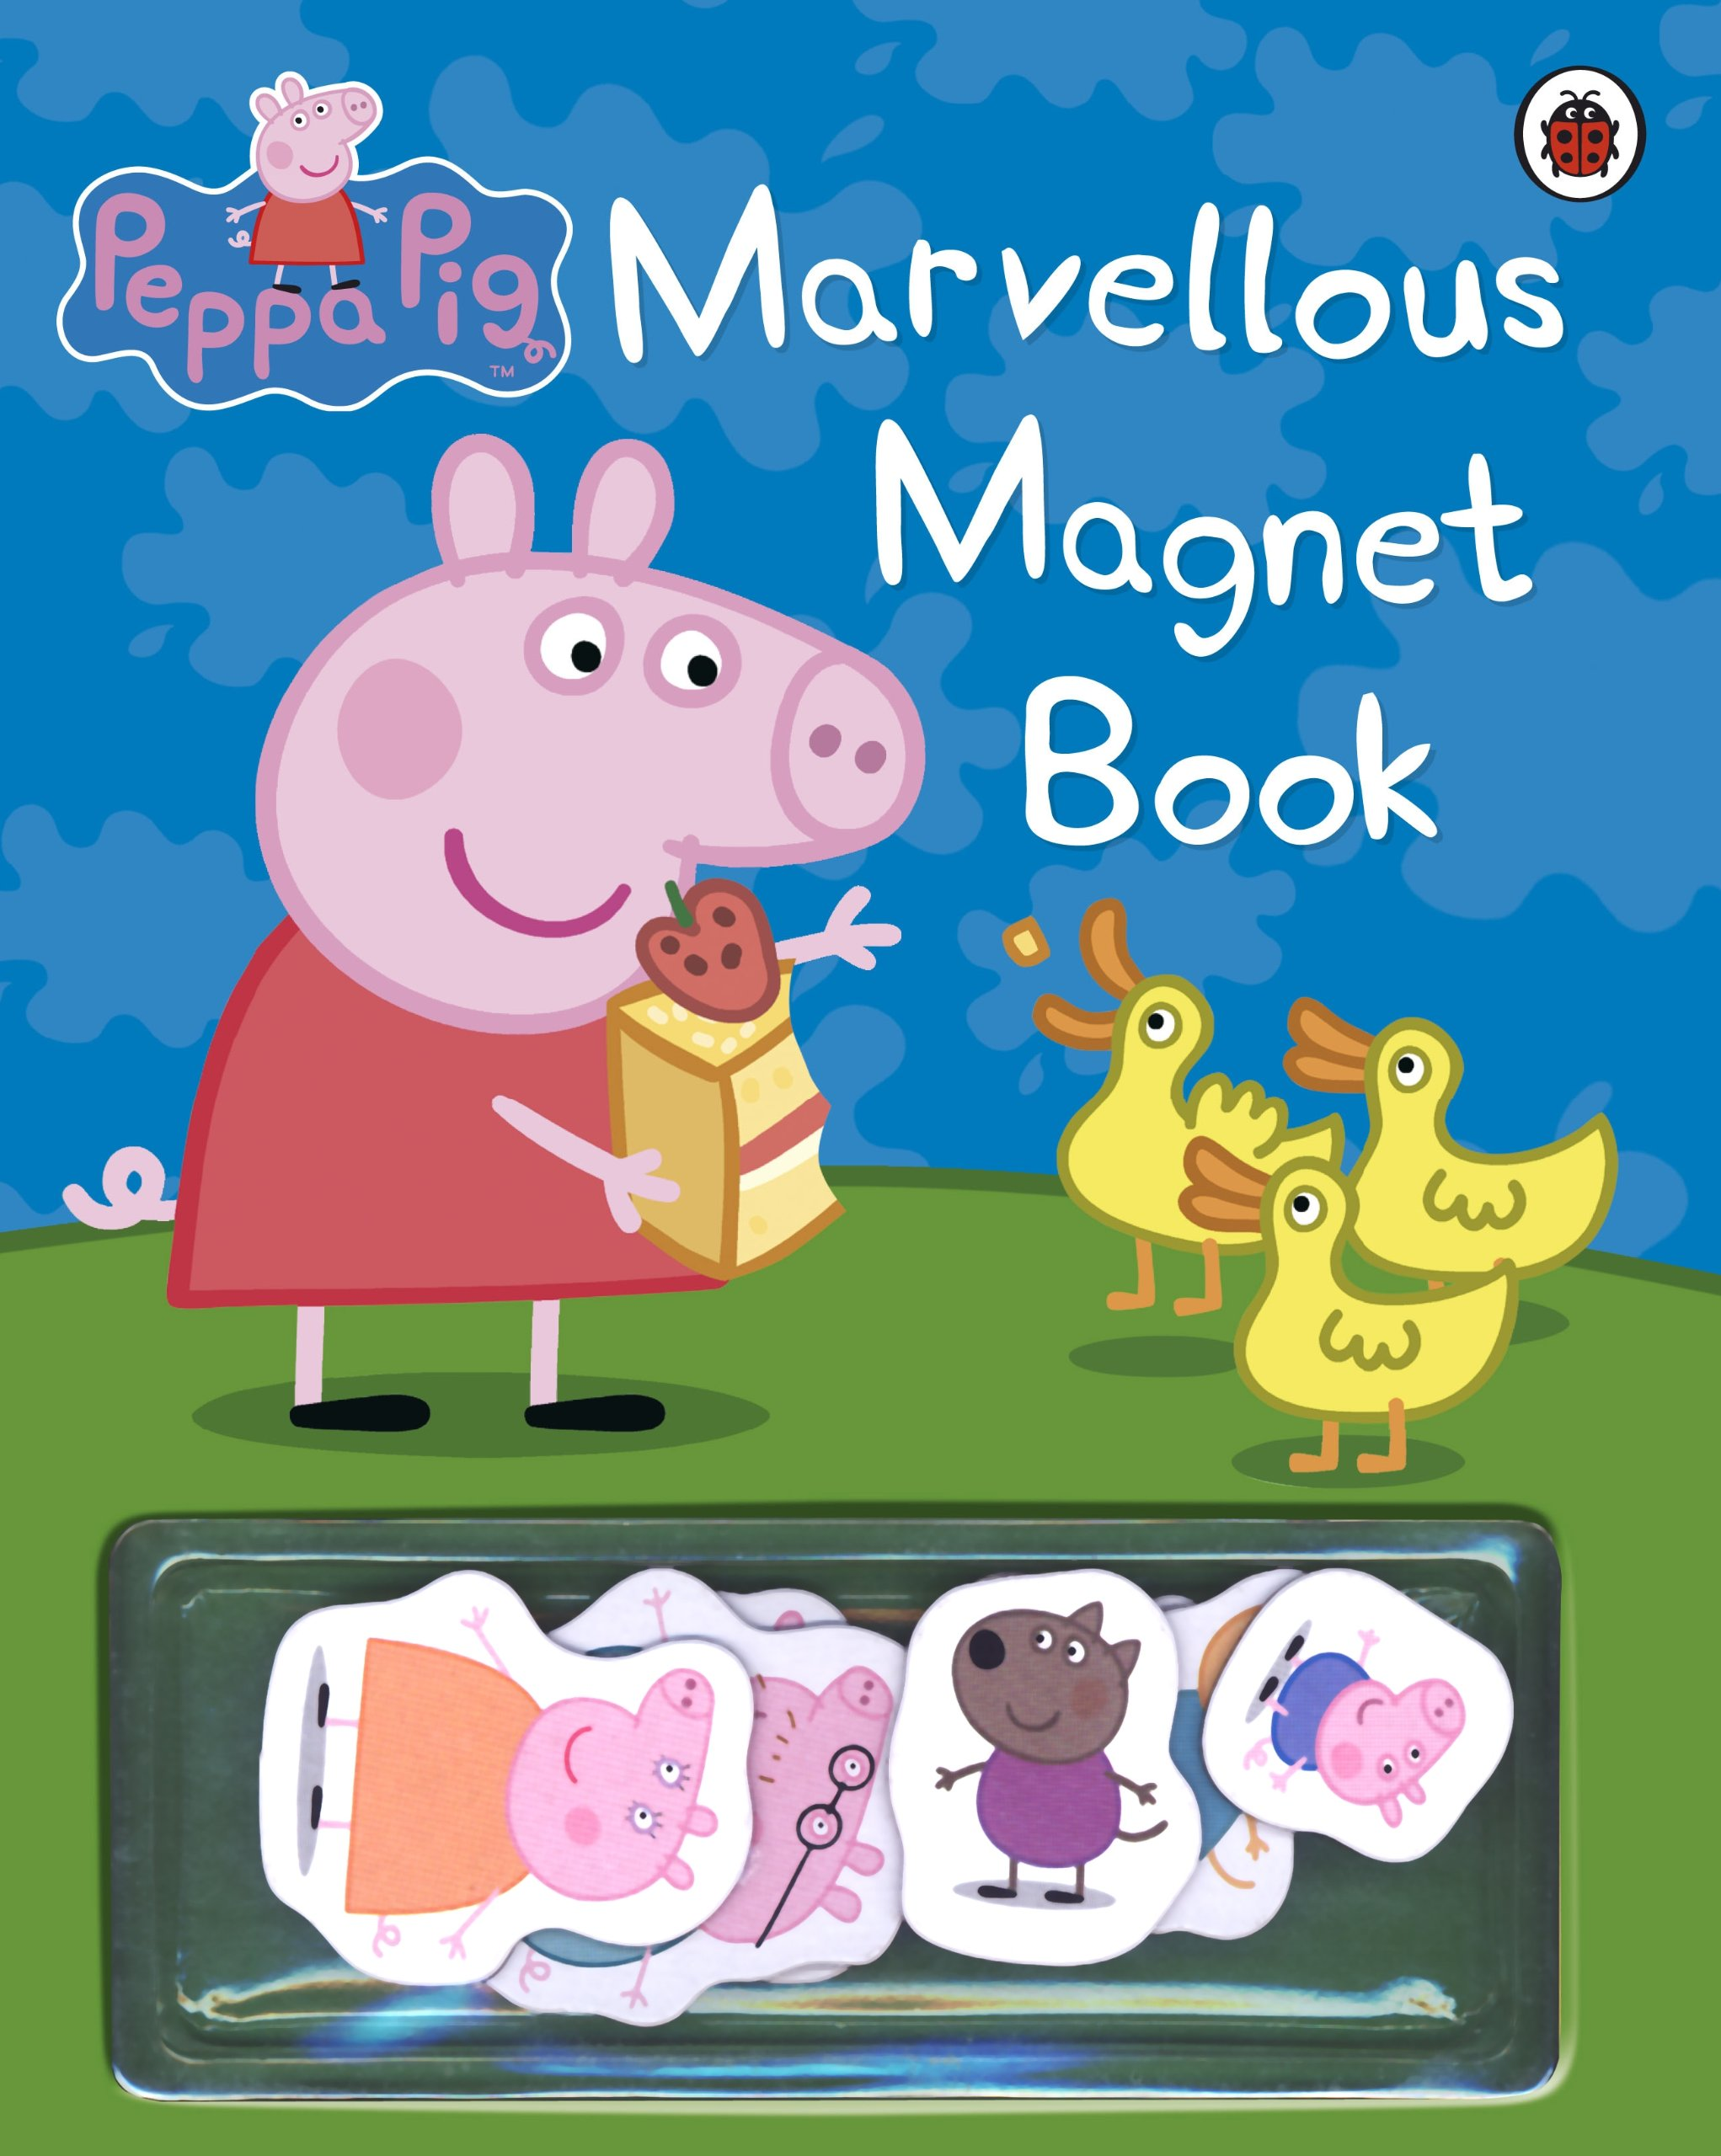 Peppa Pig: Marvellous Magnet Book [Idioma Inglés]: Amazon.es: Ladybird: Libros en idiomas extranjeros